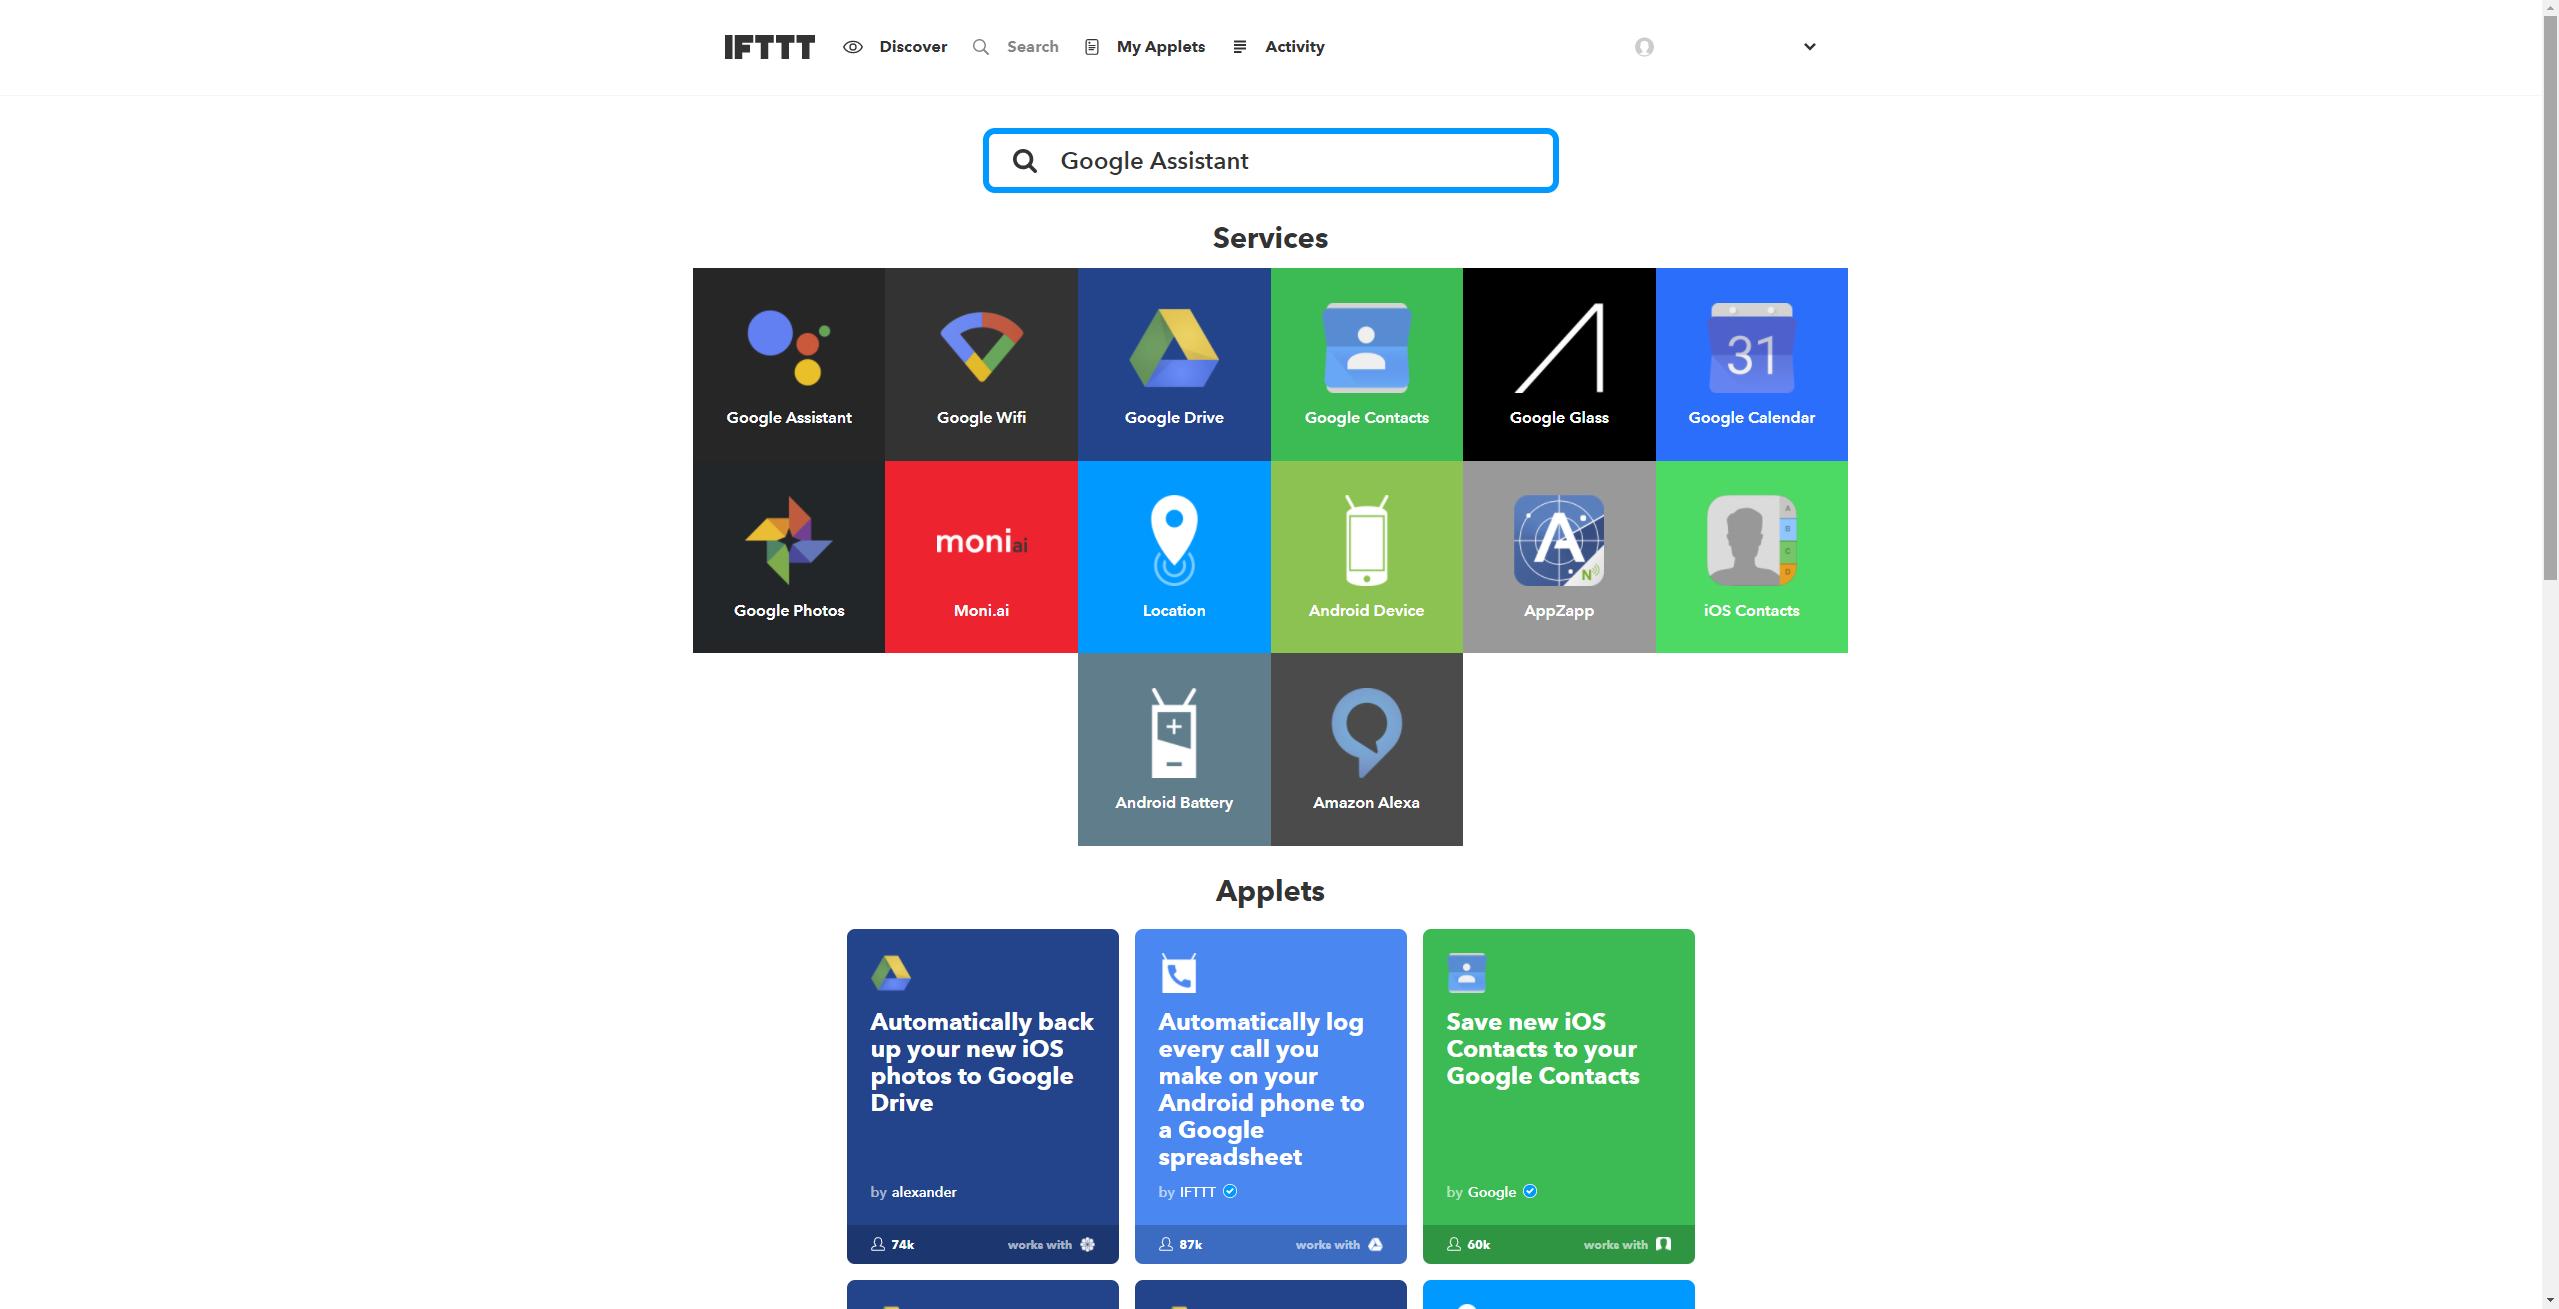 IFTTT-Google-Assistant-hinzufügen-1